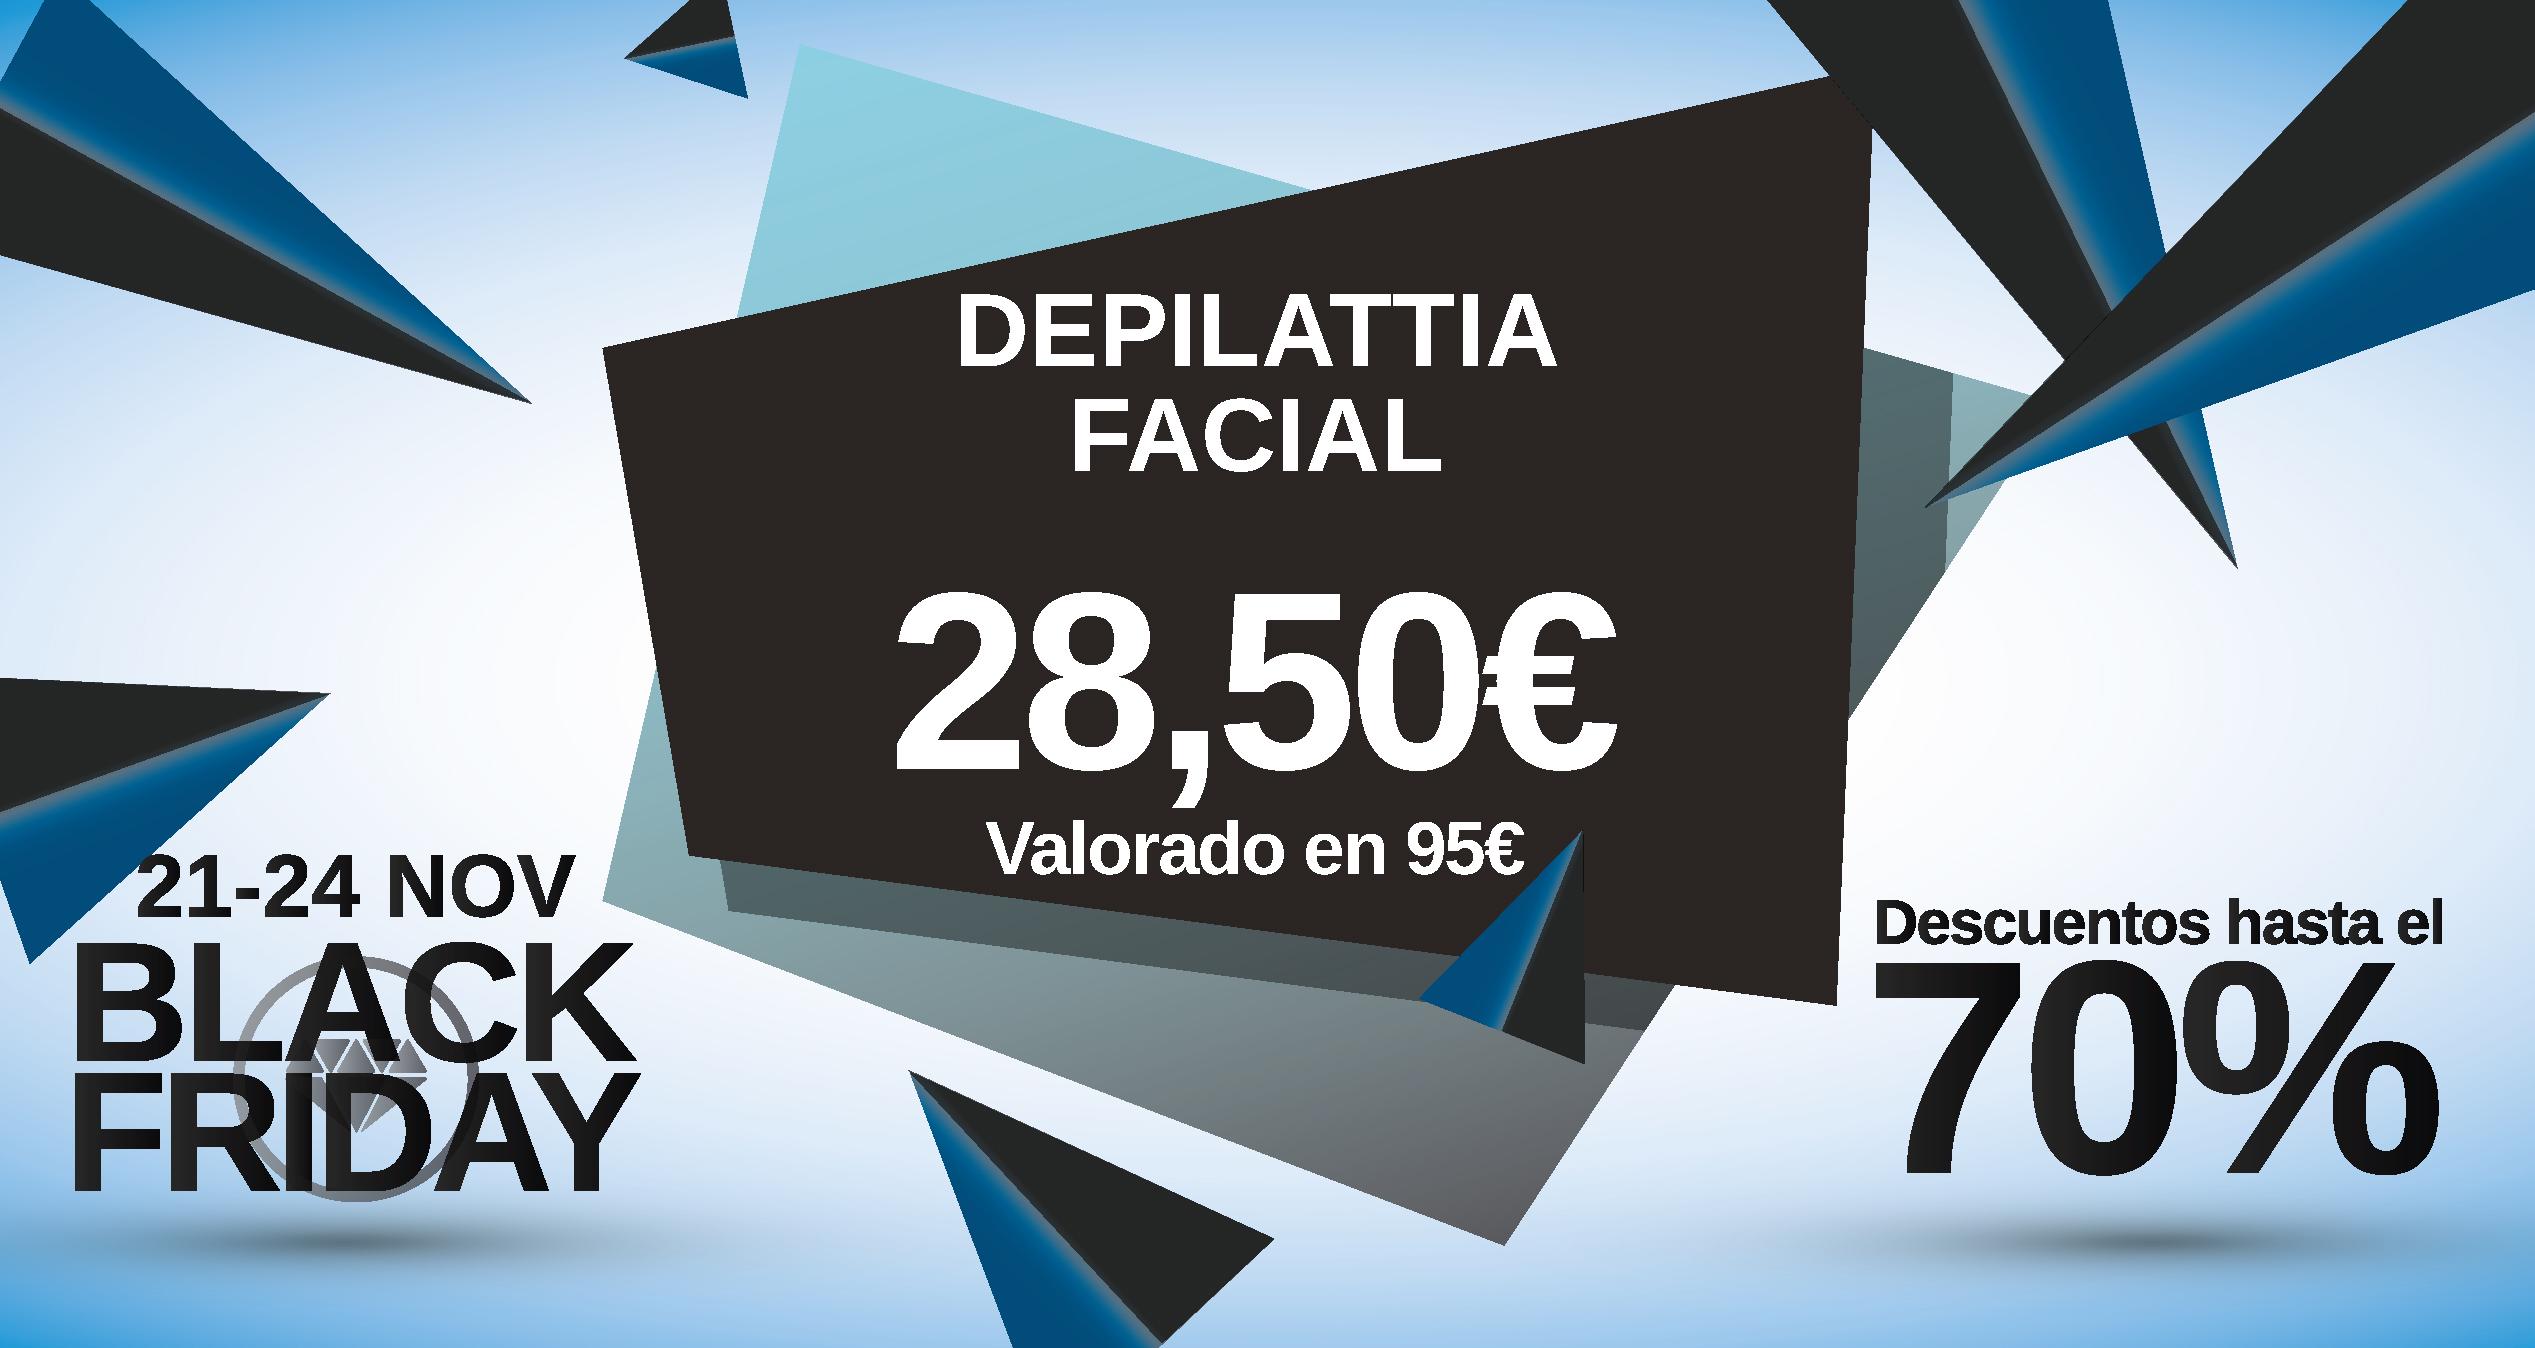 AAFF-Black-friday-depilattia-spa_facial-FACEBOOK